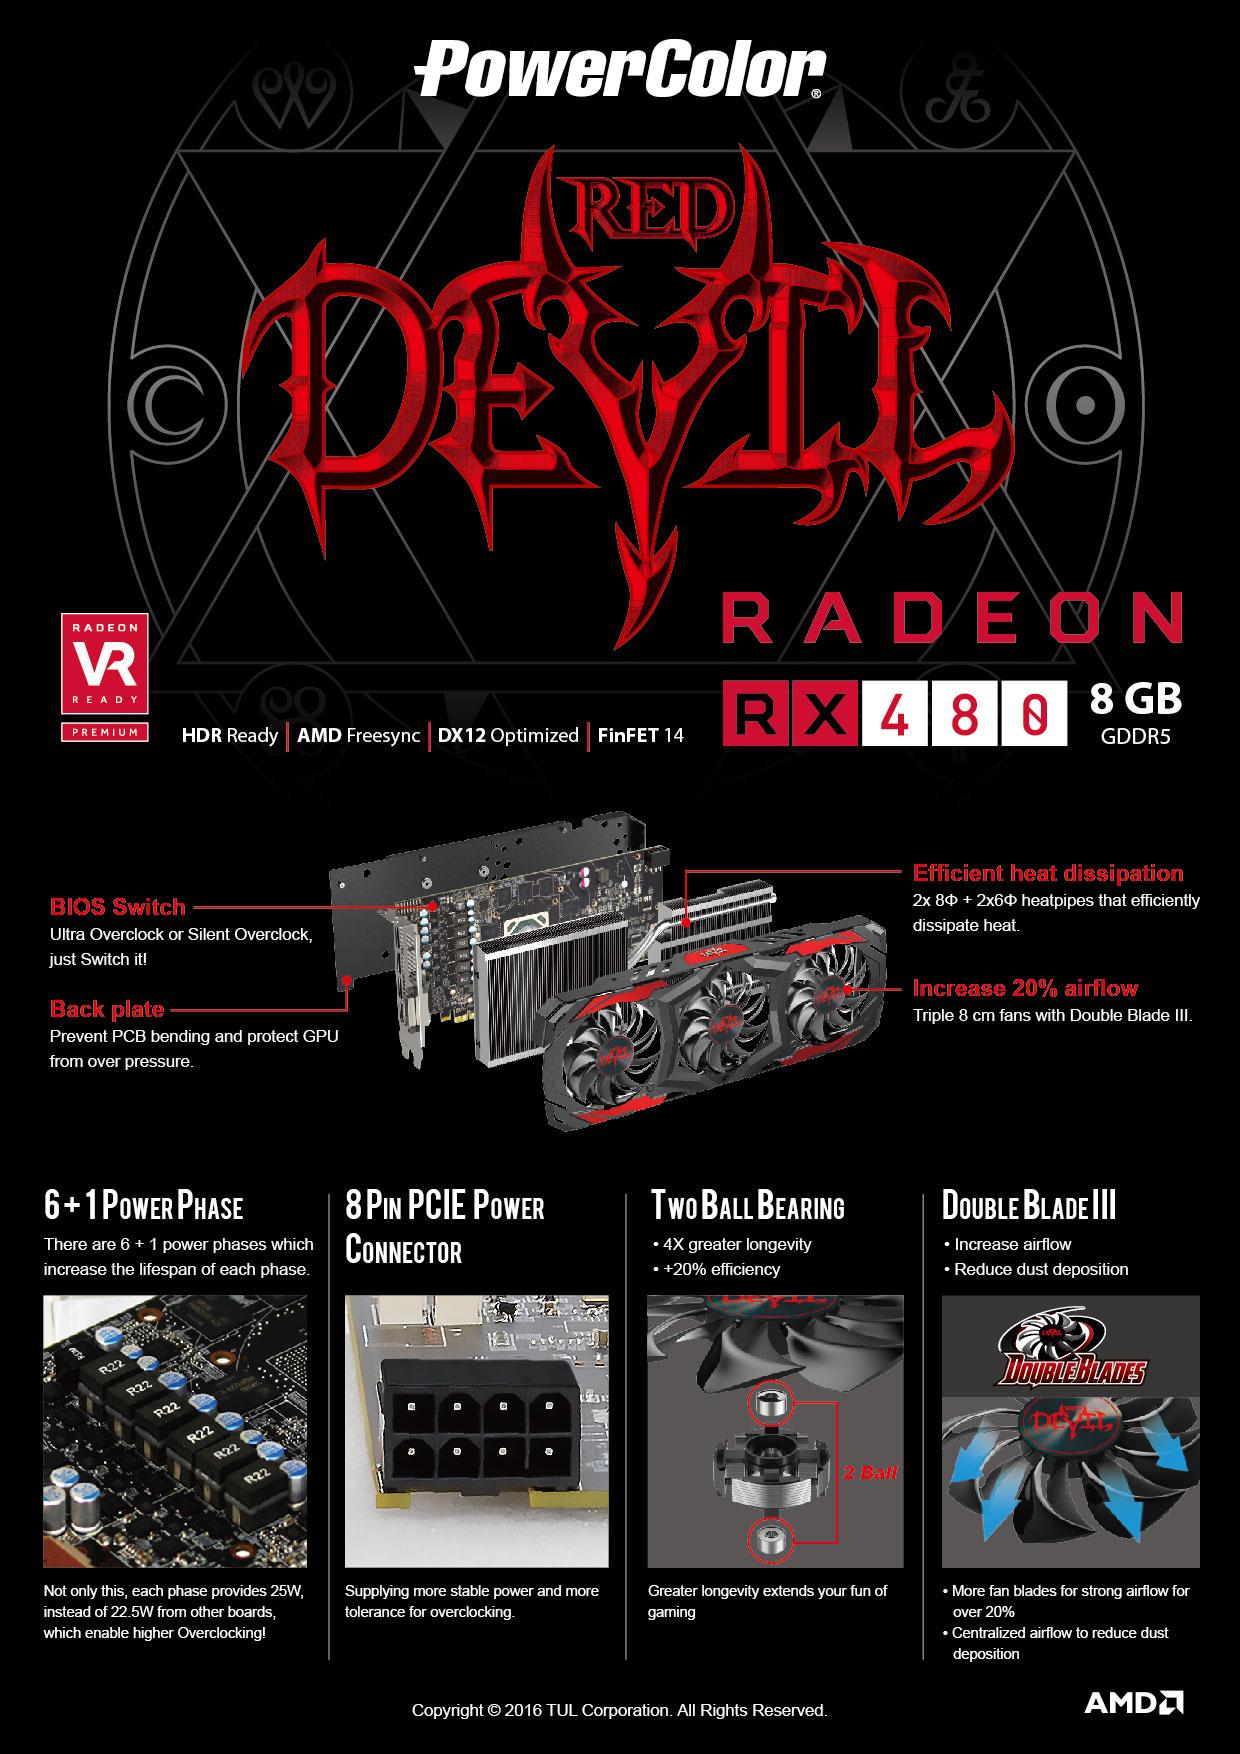 PowerColor RED DEVIL Radeon RX 480 DirectX 12 AXRX 480 8GB AS IS NO POWER PARTS